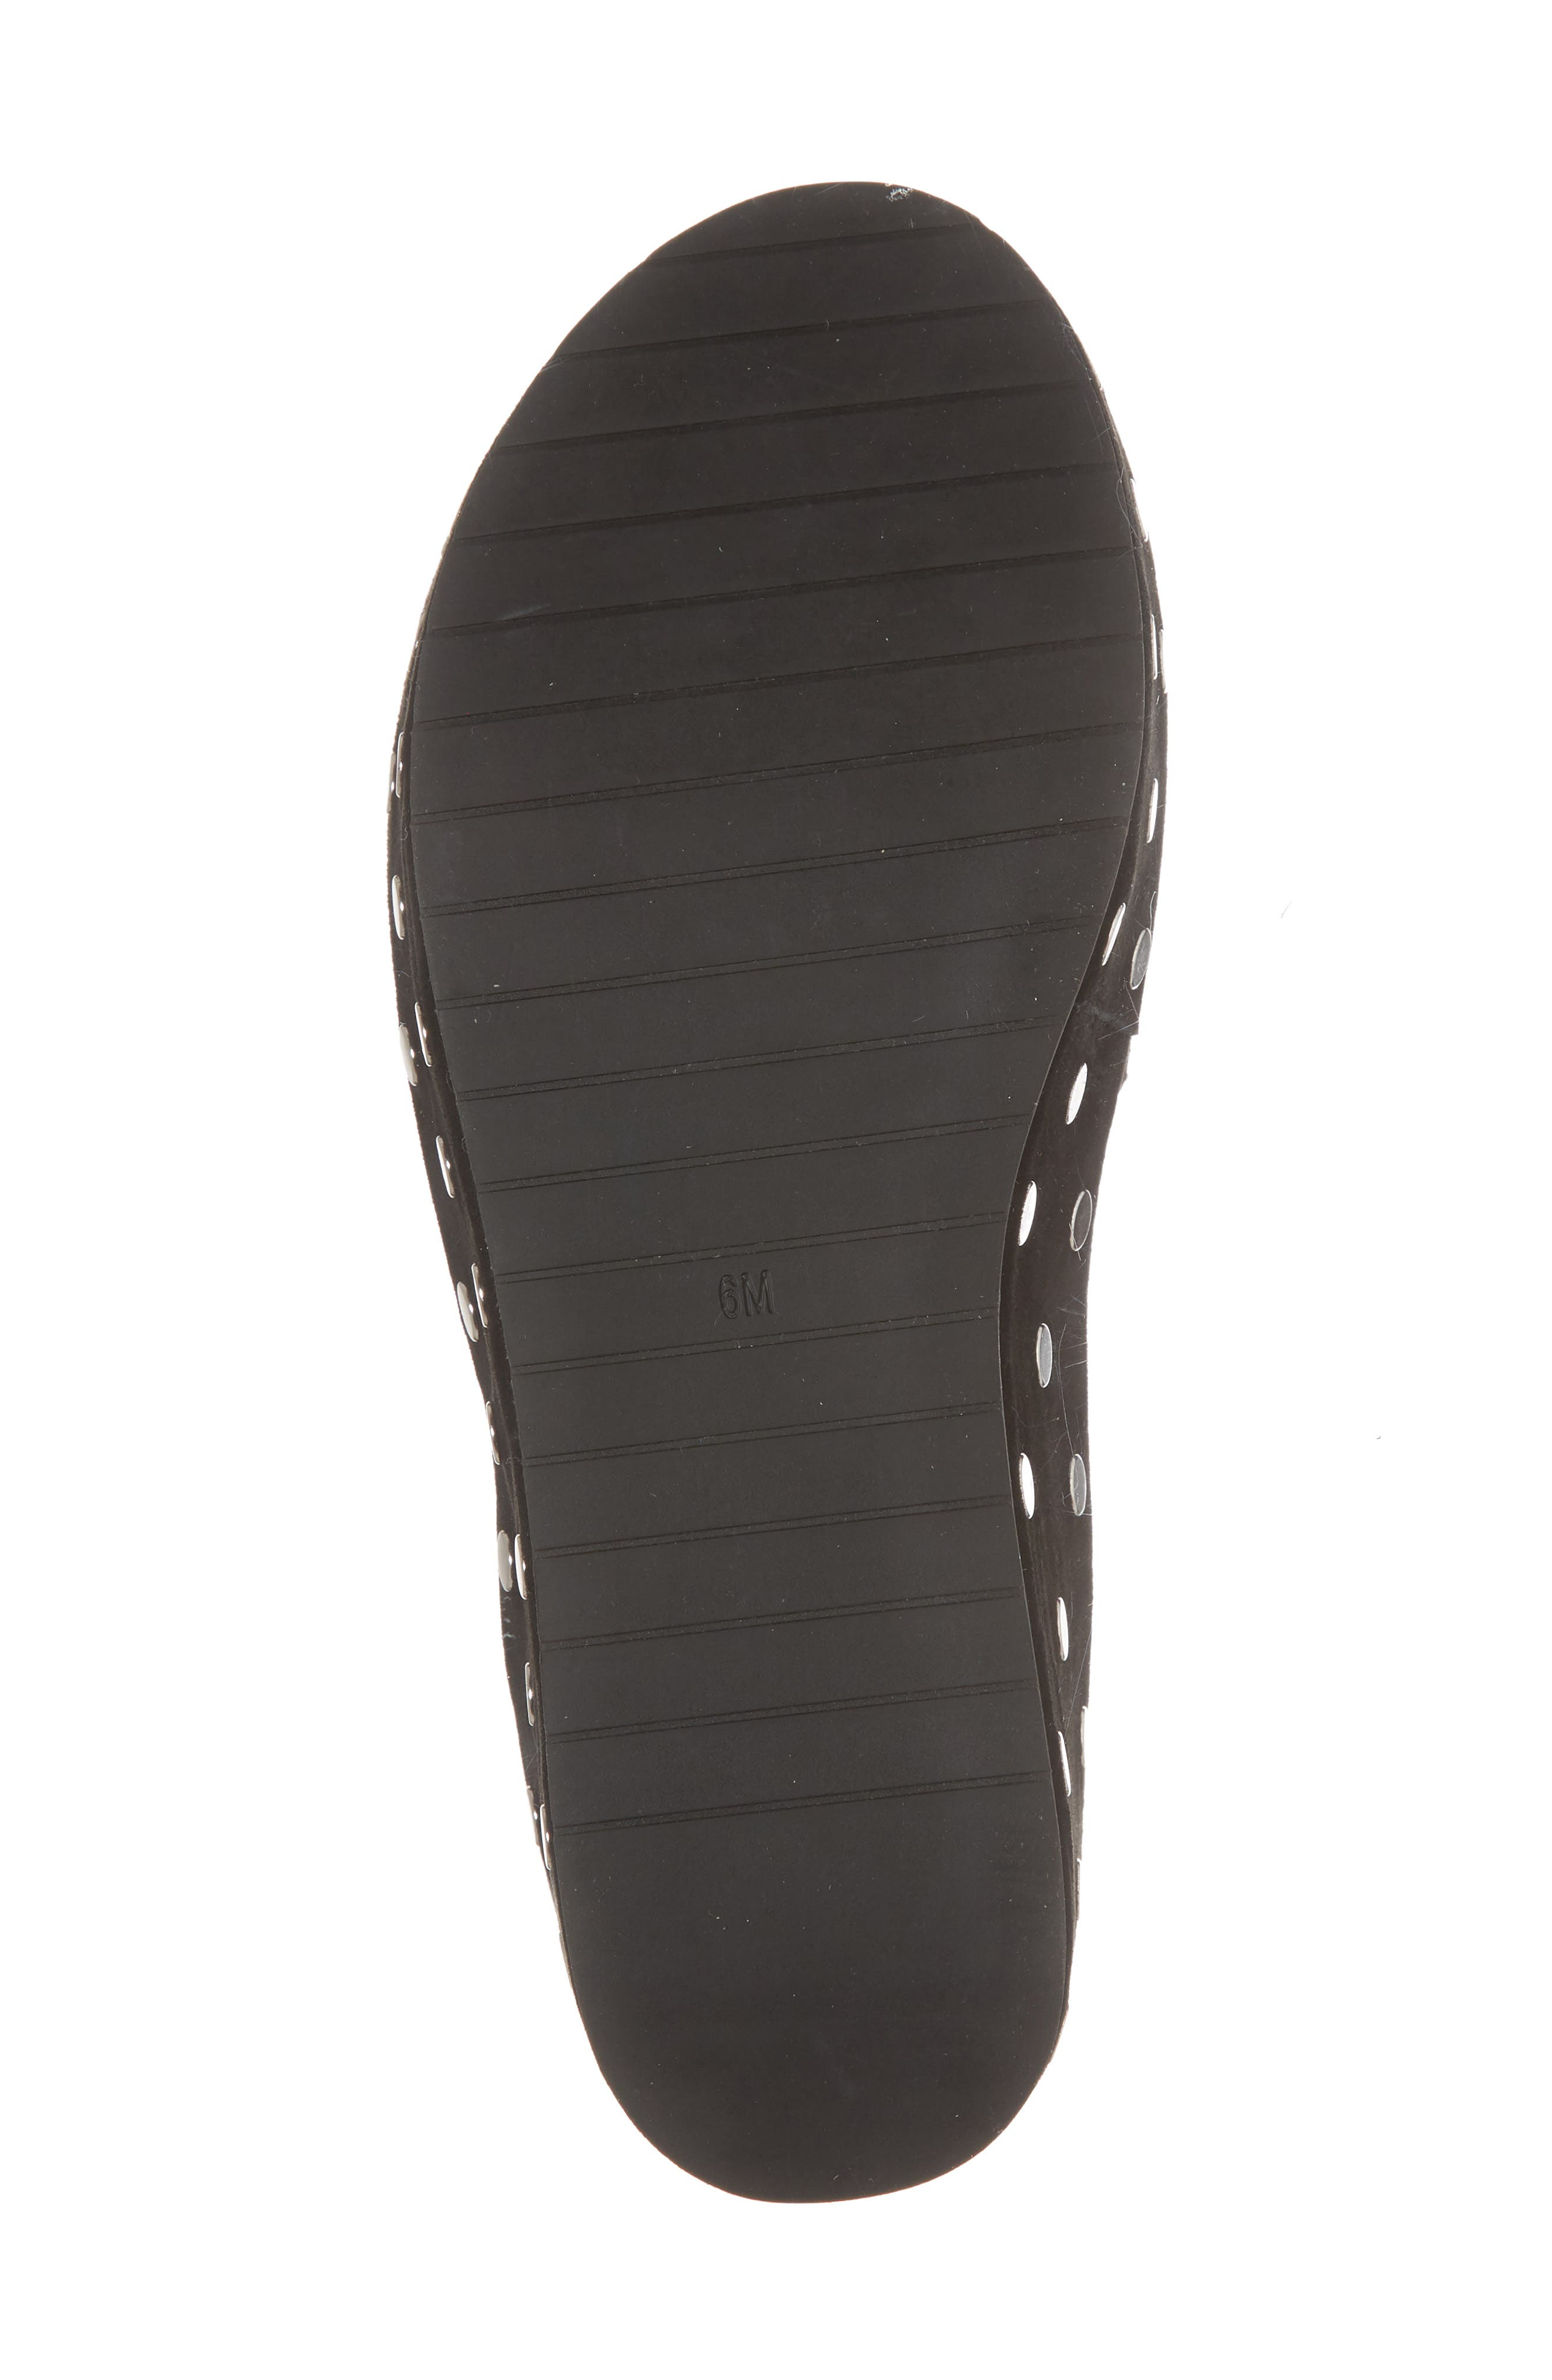 Danton Studs Platform Sandal,                             Alternate thumbnail 6, color,                             Black Suede